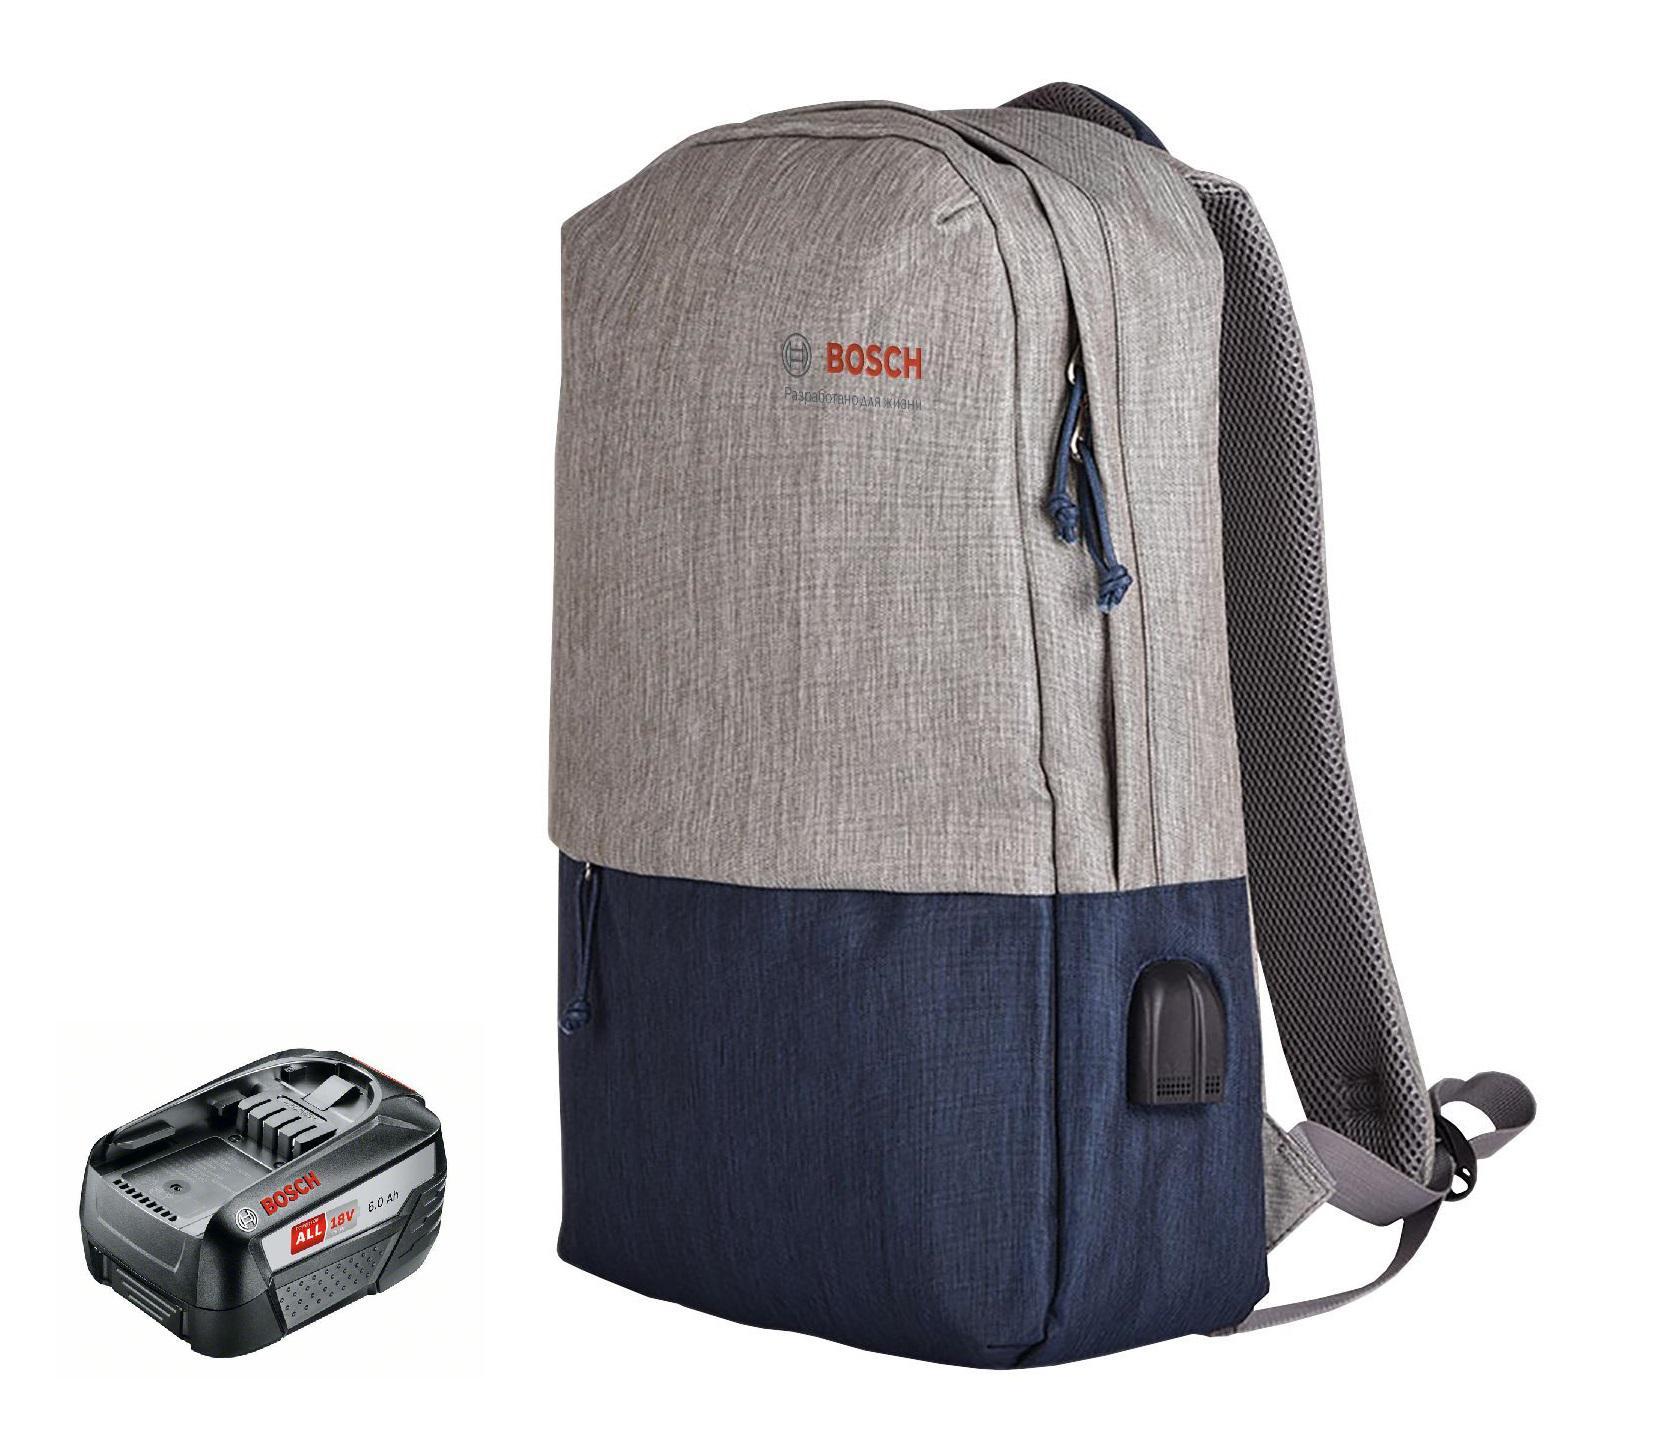 Фото - Набор Bosch Аккумулятор 18В 6Ач li-ion pba (1600a00dd7) +Рюкзак 1.619.m00.k04 набор bosch дрель аккумуляторная universaldrill 18 2акк и зу 06039c8005 рюкзак 1 619 m00 k04